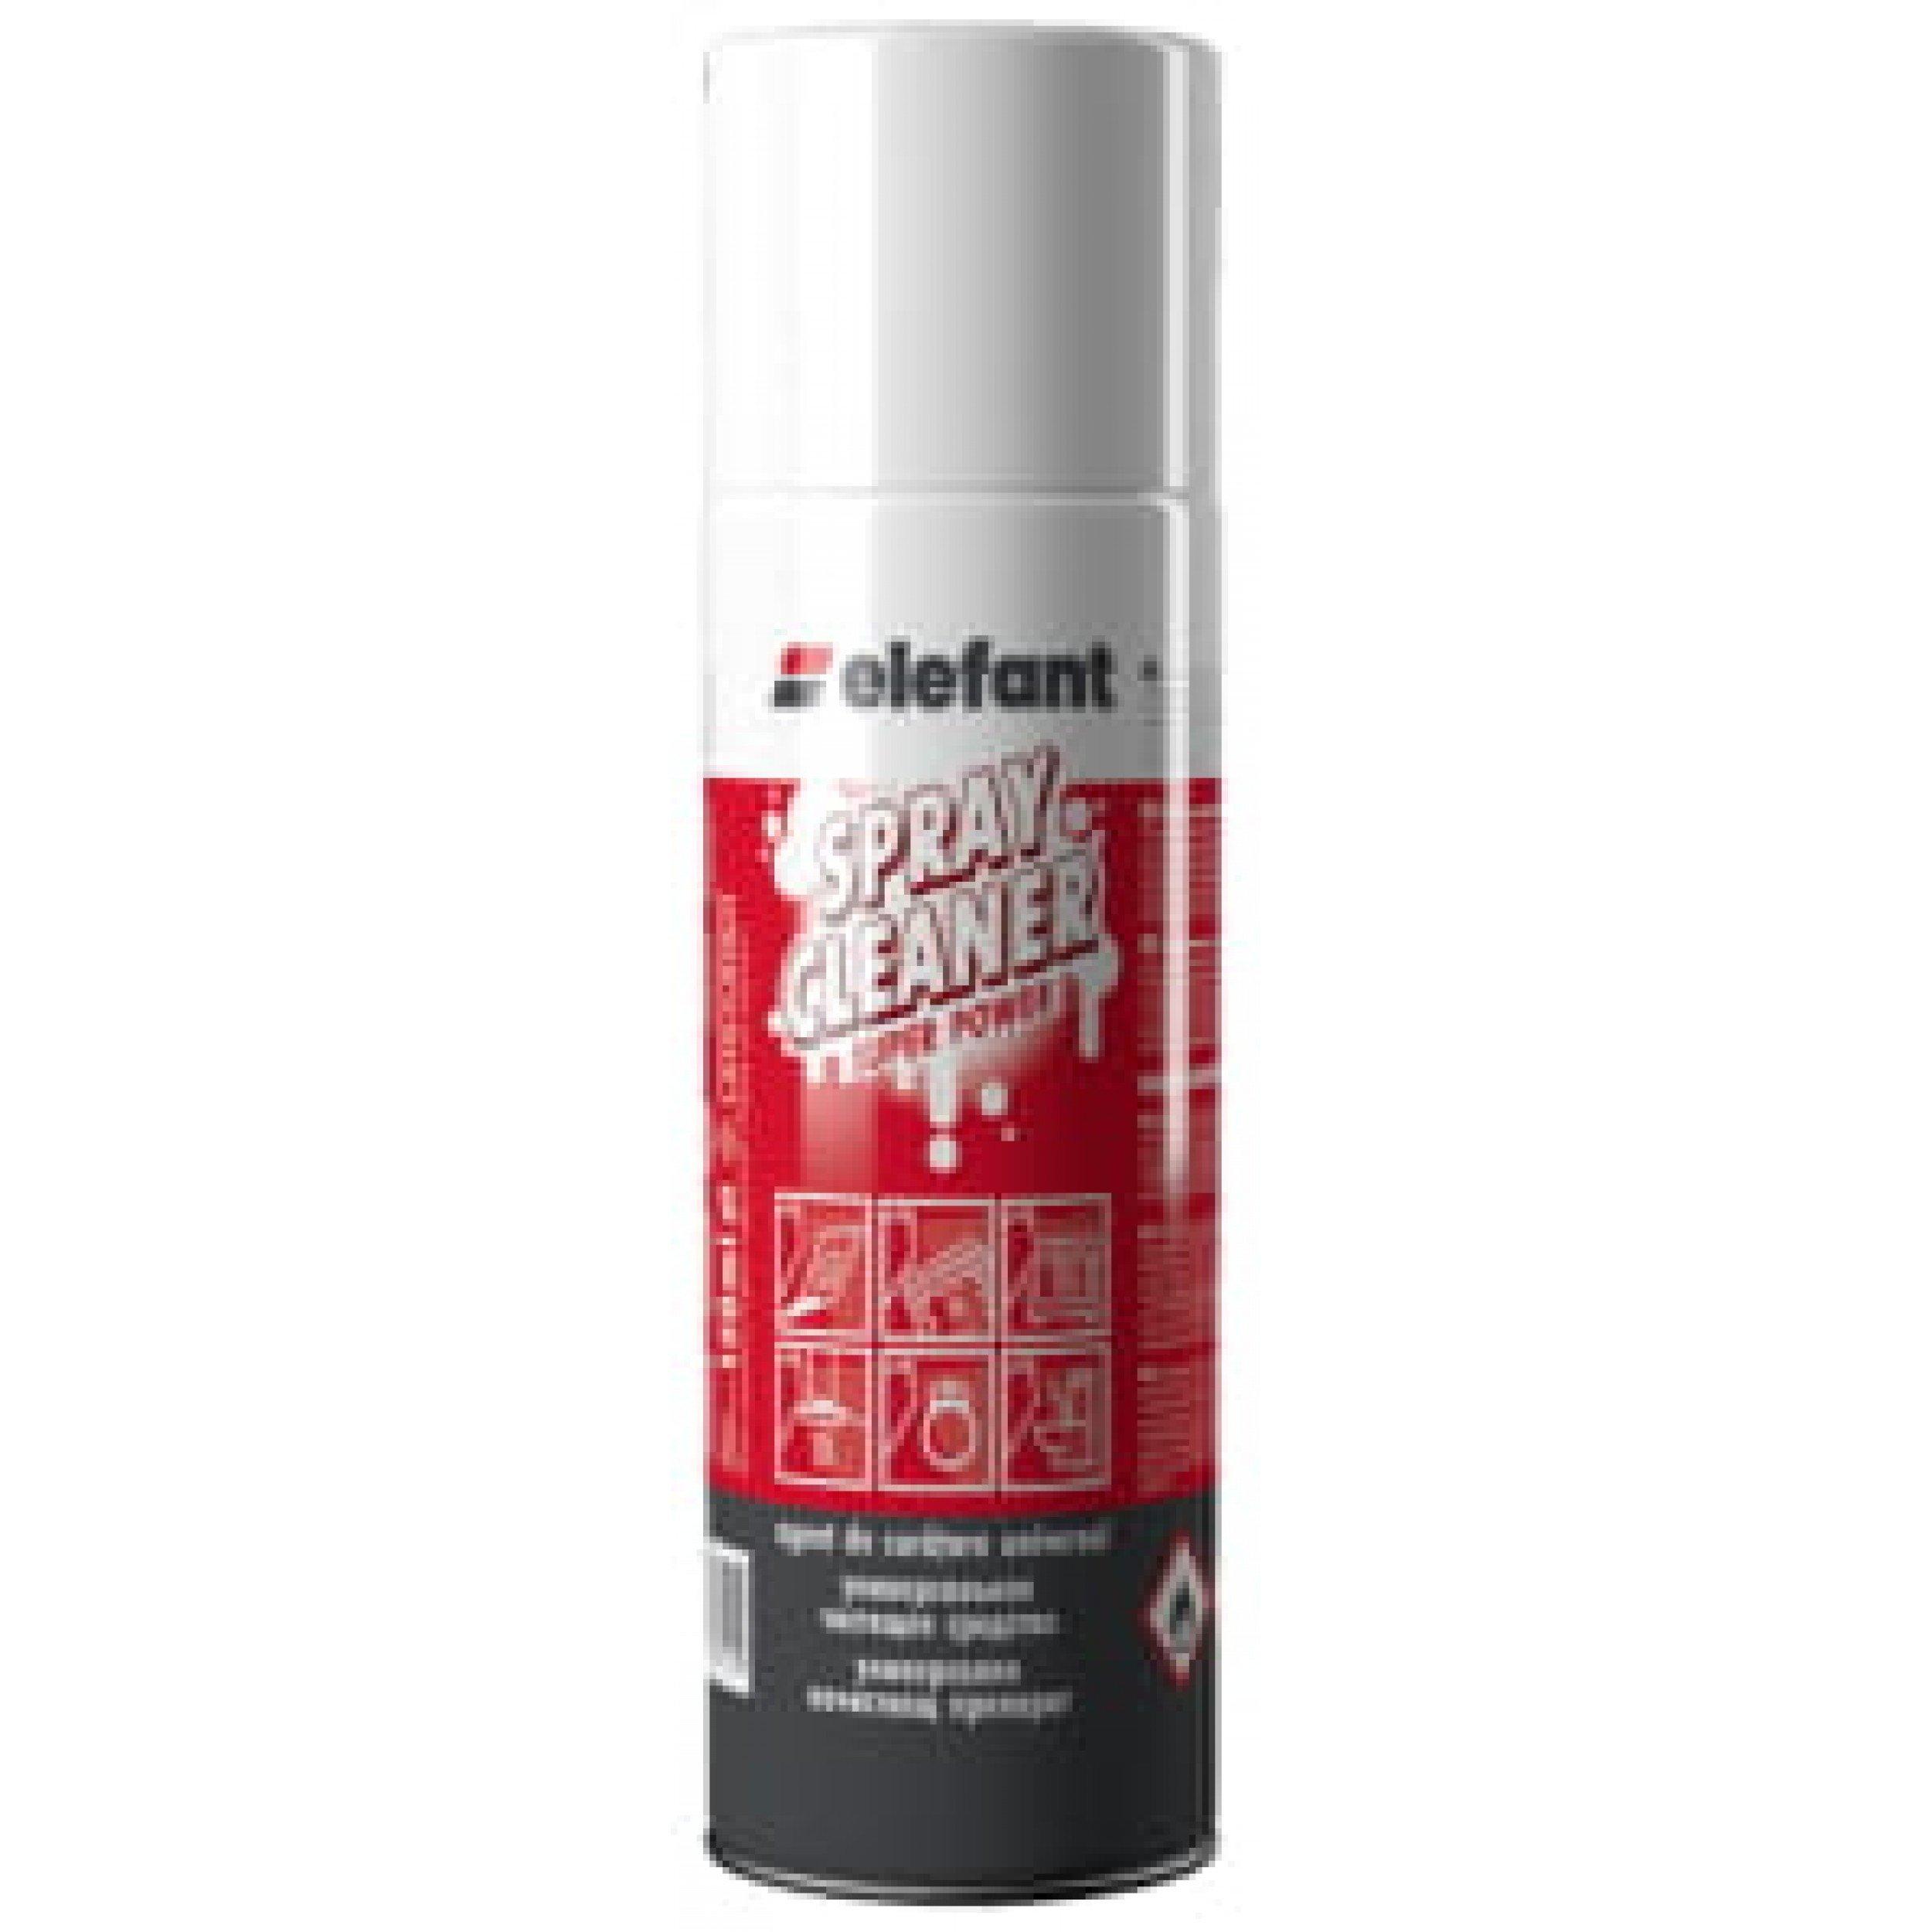 Elefant Spray Purificator (Spray Cleaner) 150ml